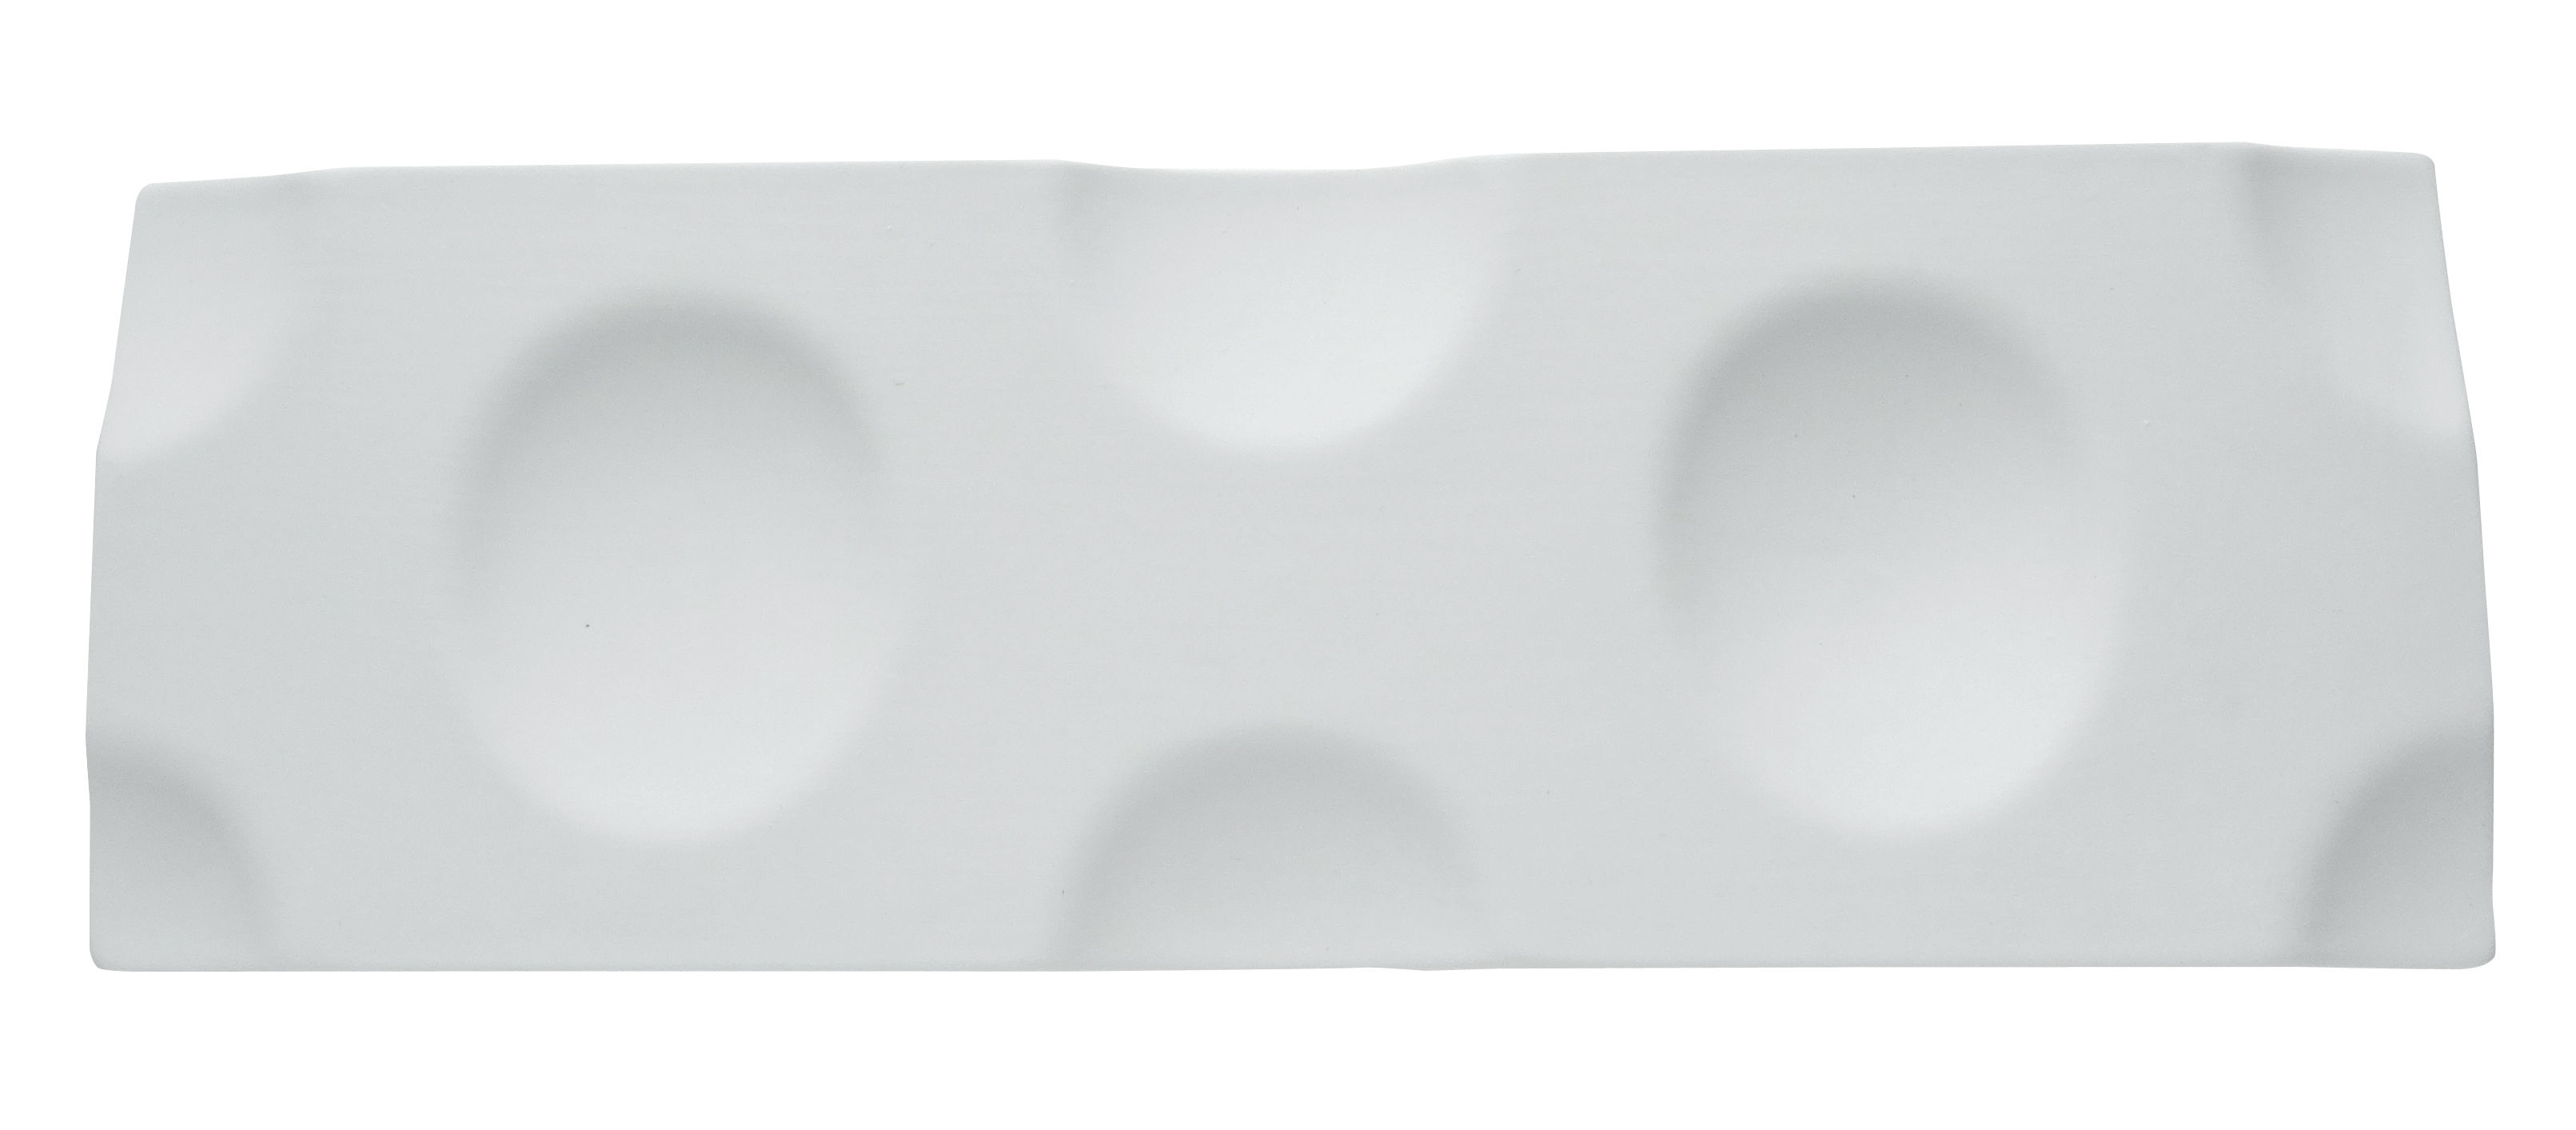 Tableware - Trays - Jo 2 Tray - 2 bowls stand - 29 x 10 cm by cookplay - Matt white - Matt porcelain